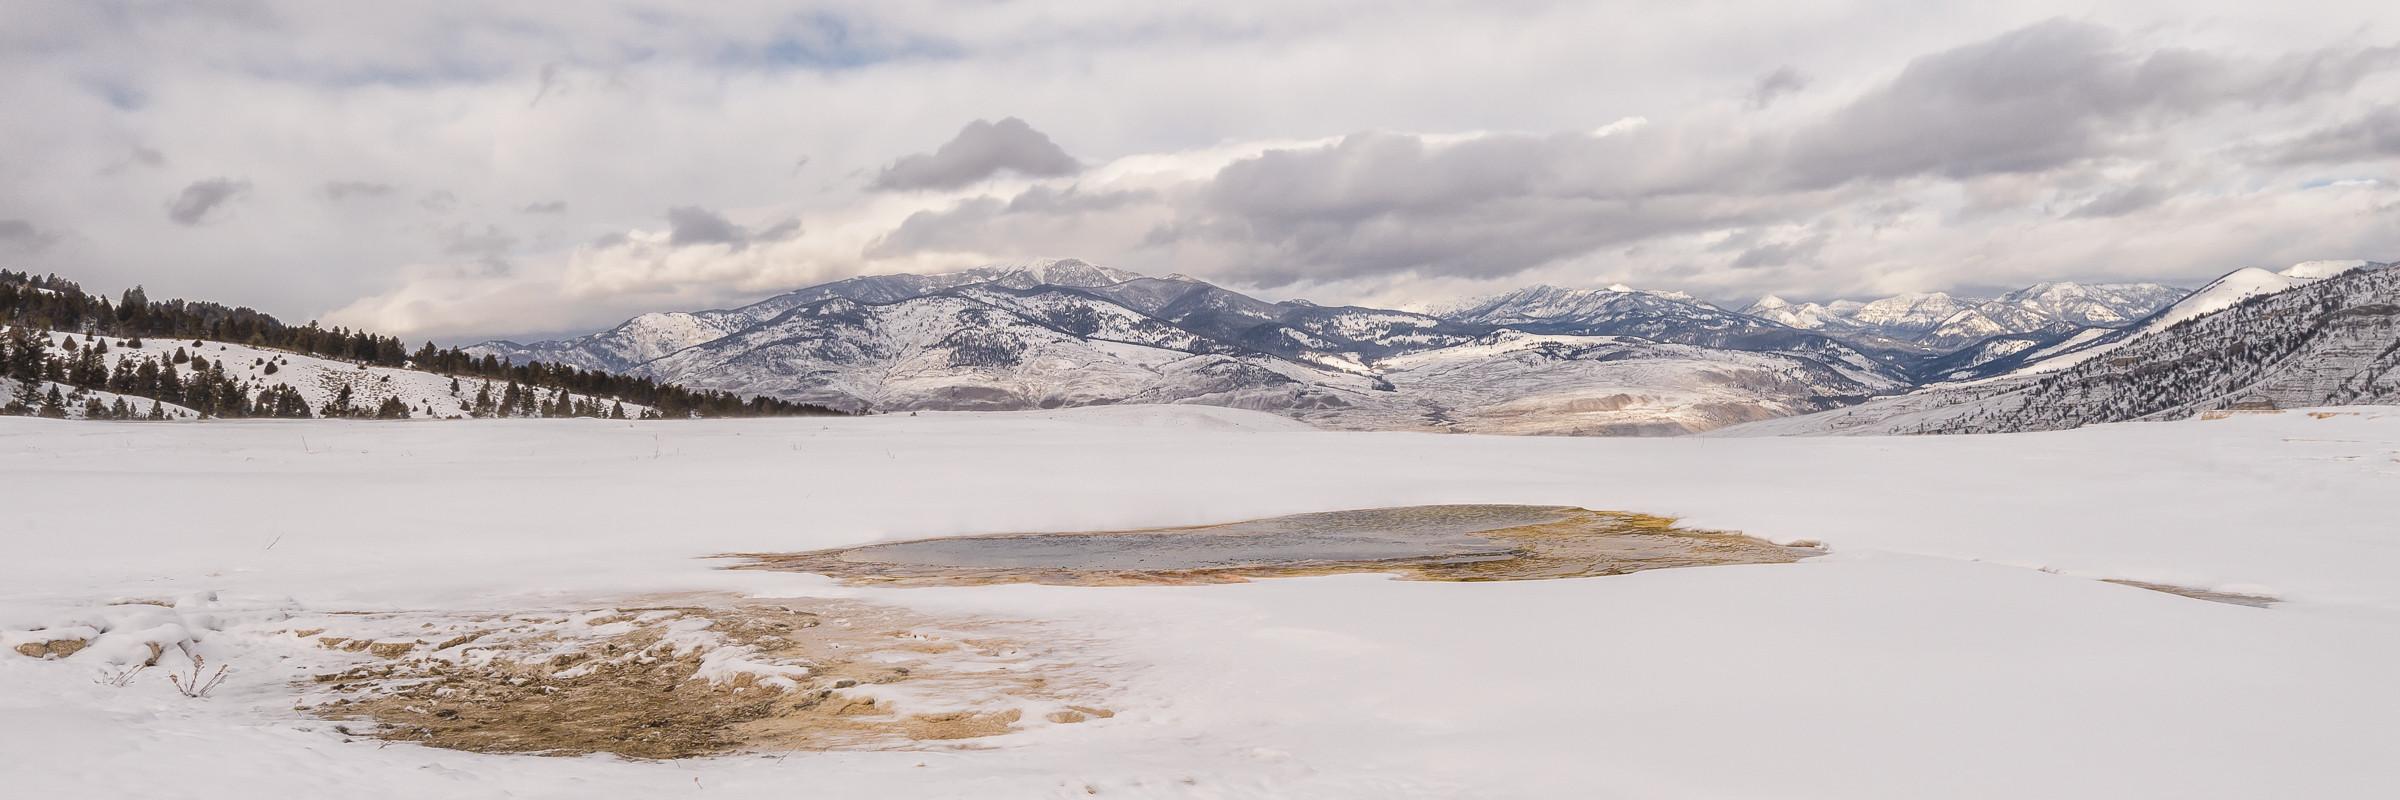 landschap Yellowstone 8300